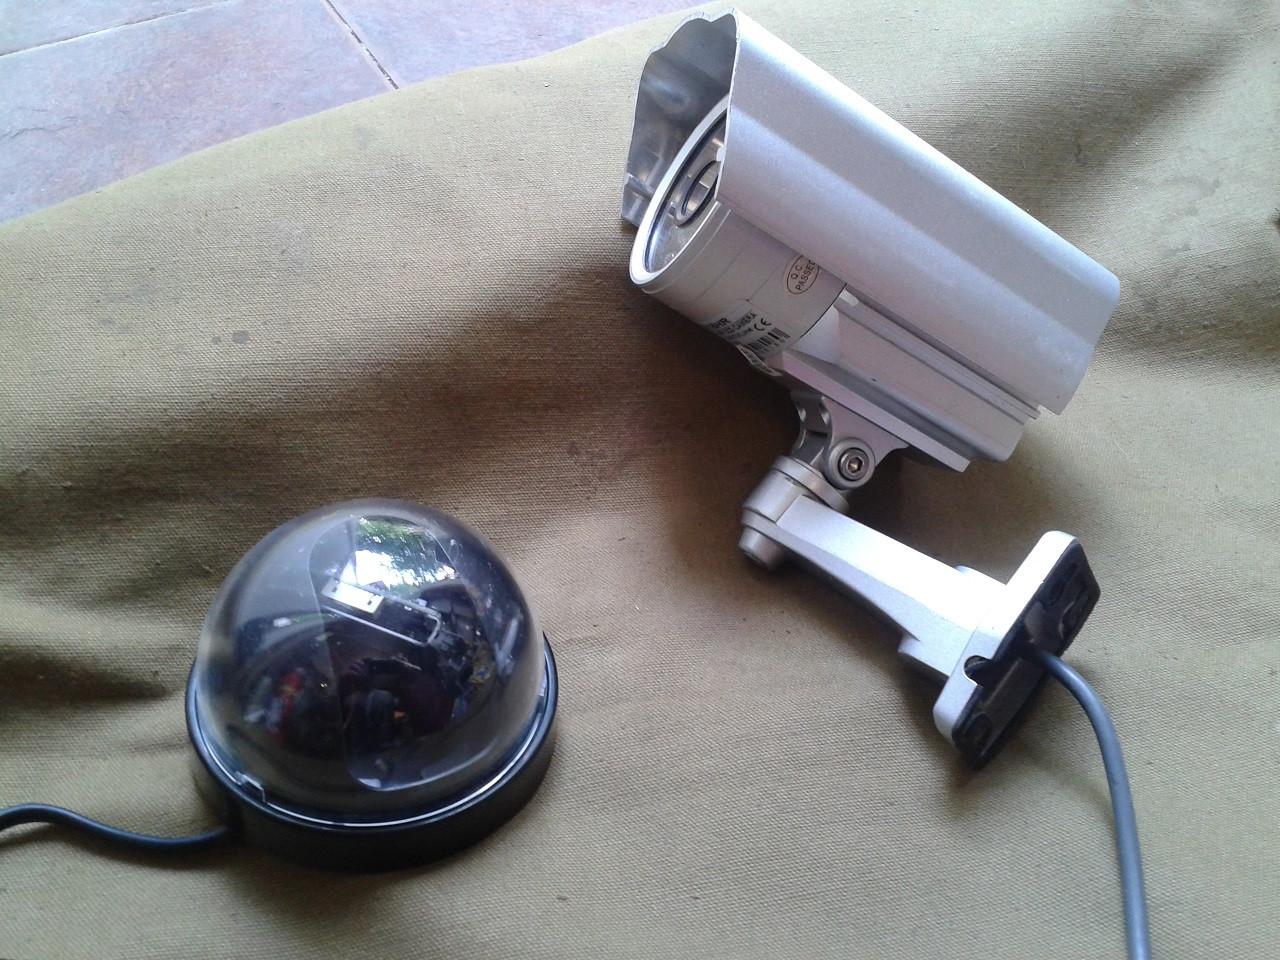 В КНР за28 долларов реализуют шпионскую программу для веб-камер